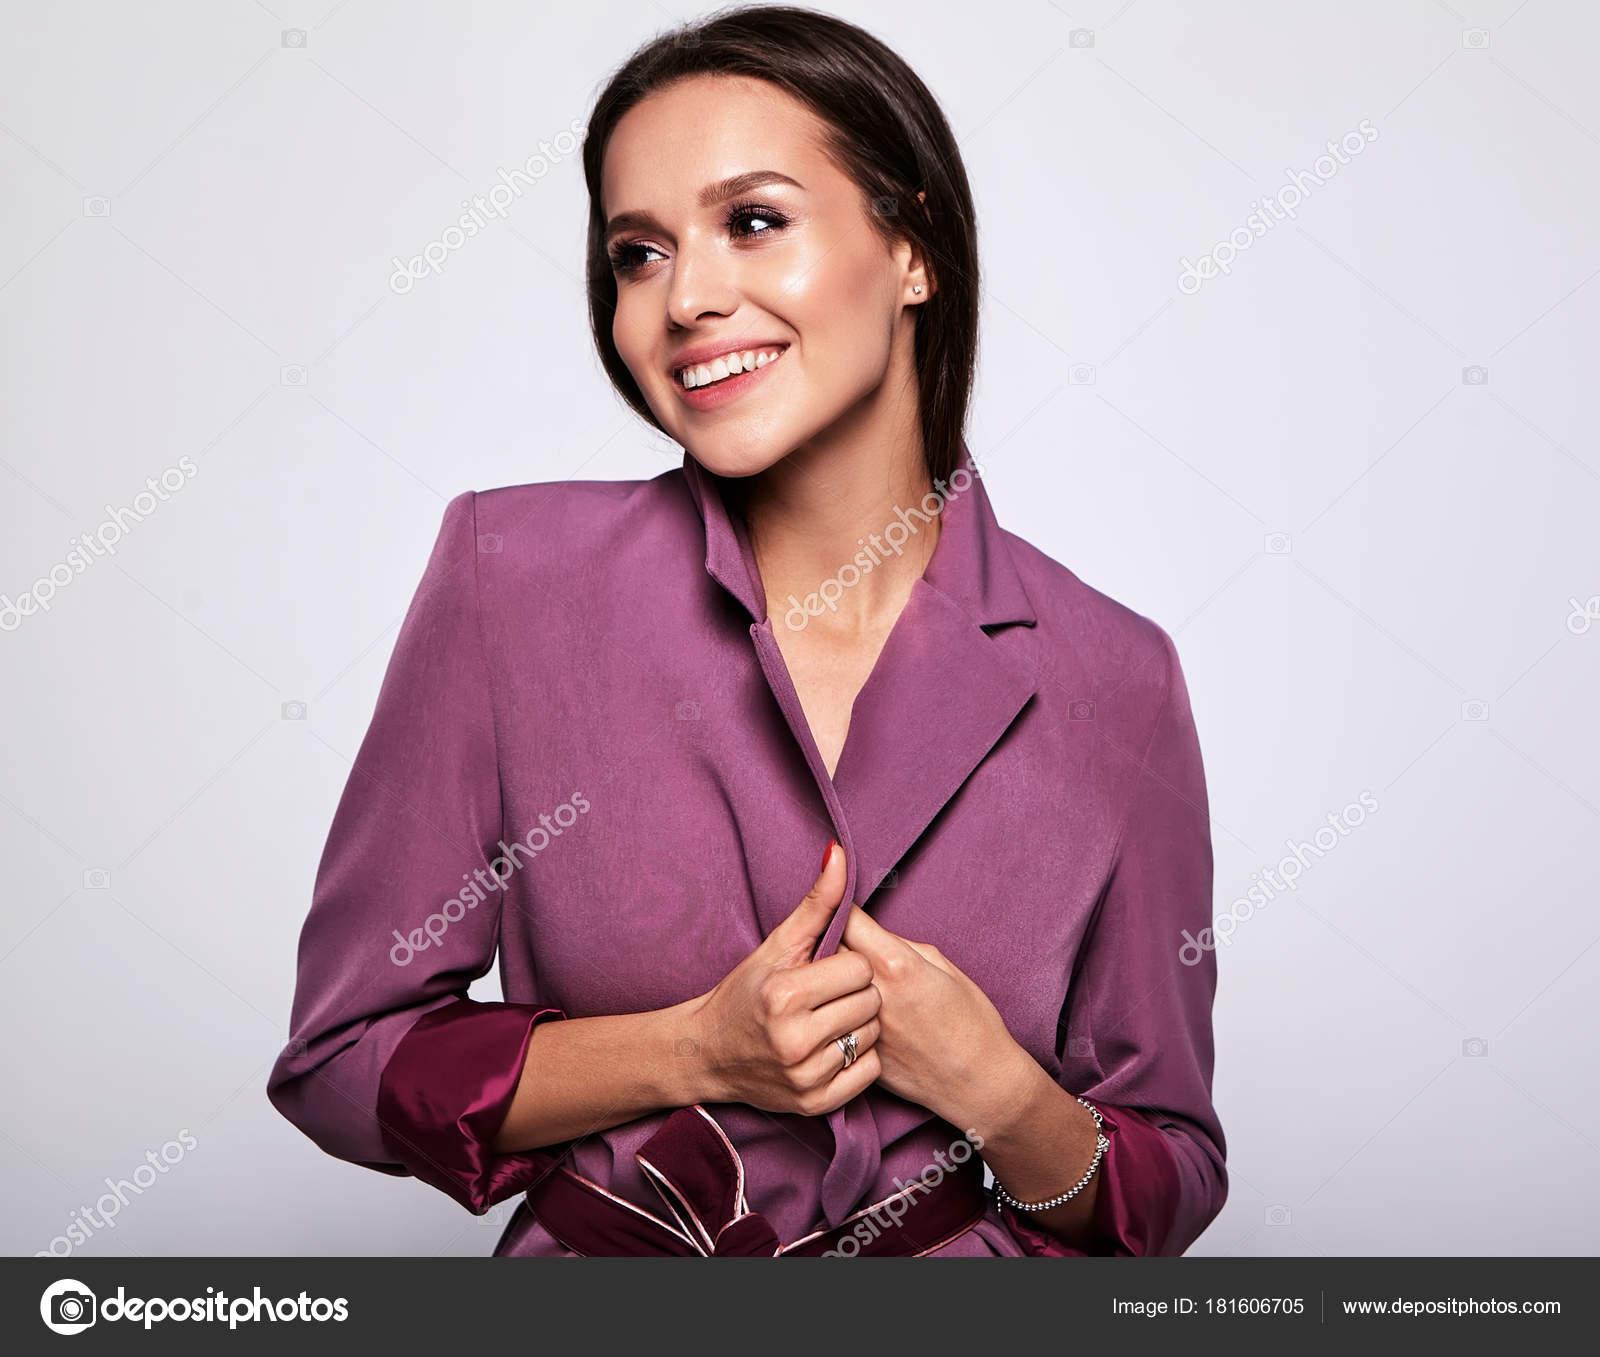 66aa8cd05d5a Πορτρέτο του όμορφη γυναίκα μελαχρινή μοντέλο σε ροζ κοστούμι που δεν  μακιγιάζ που απομονώνονται σε γκρι — Εικόνα από ...